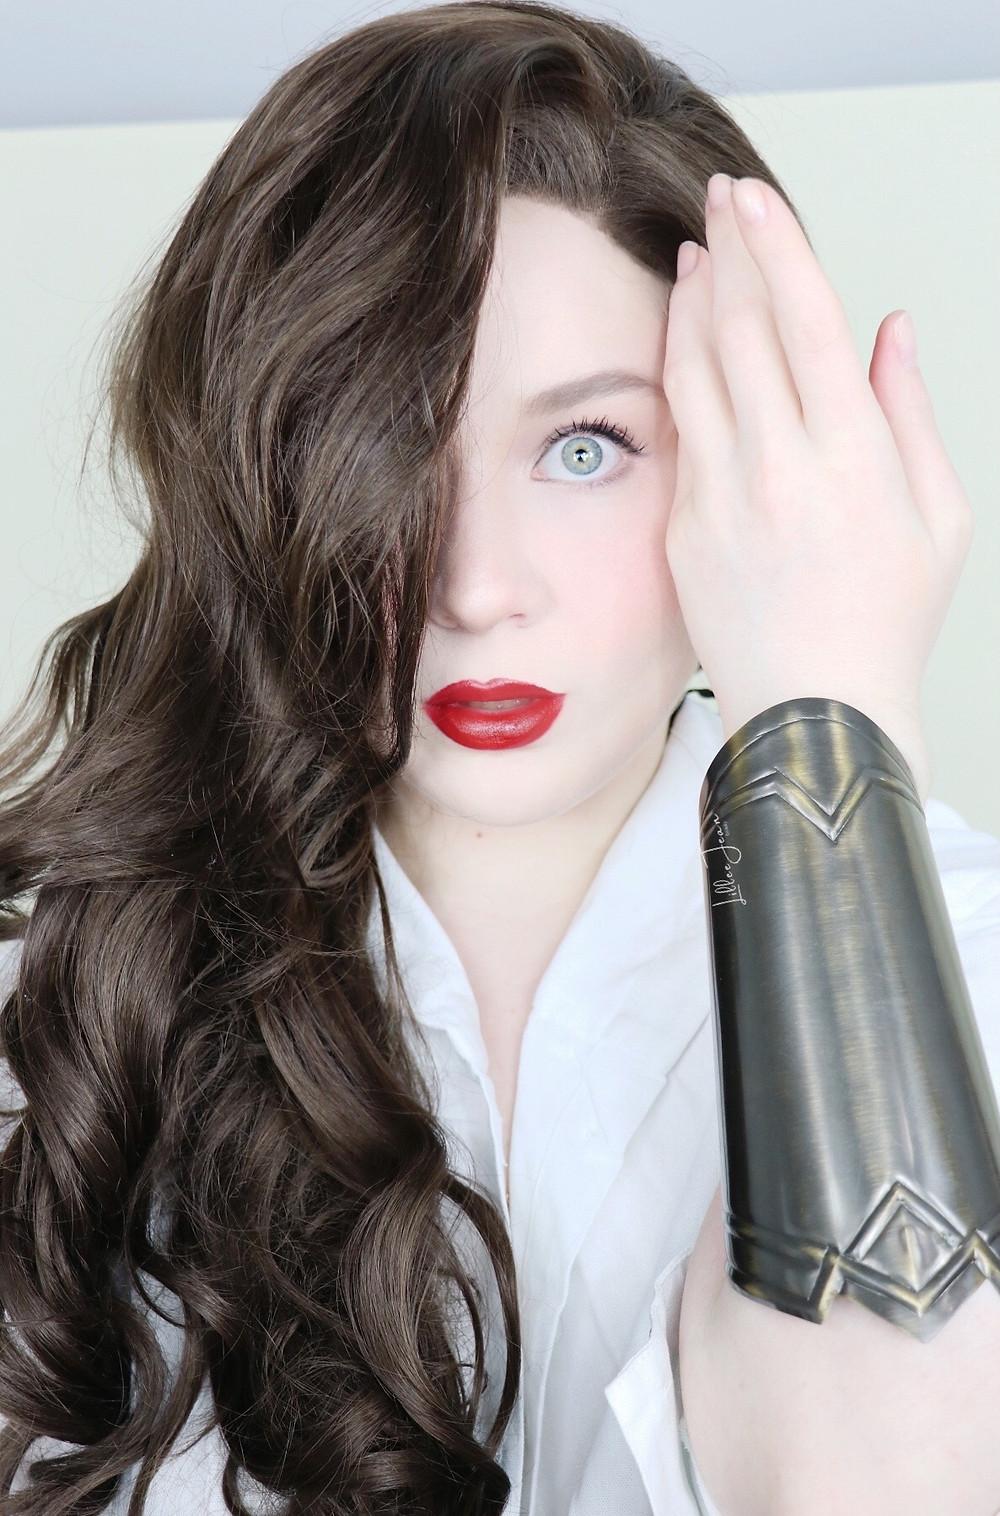 Wonder Woman 1984 WHITE Goddess DRESS CRUELTY FREE Makeup Tutorial 2021 | Lillee Jean